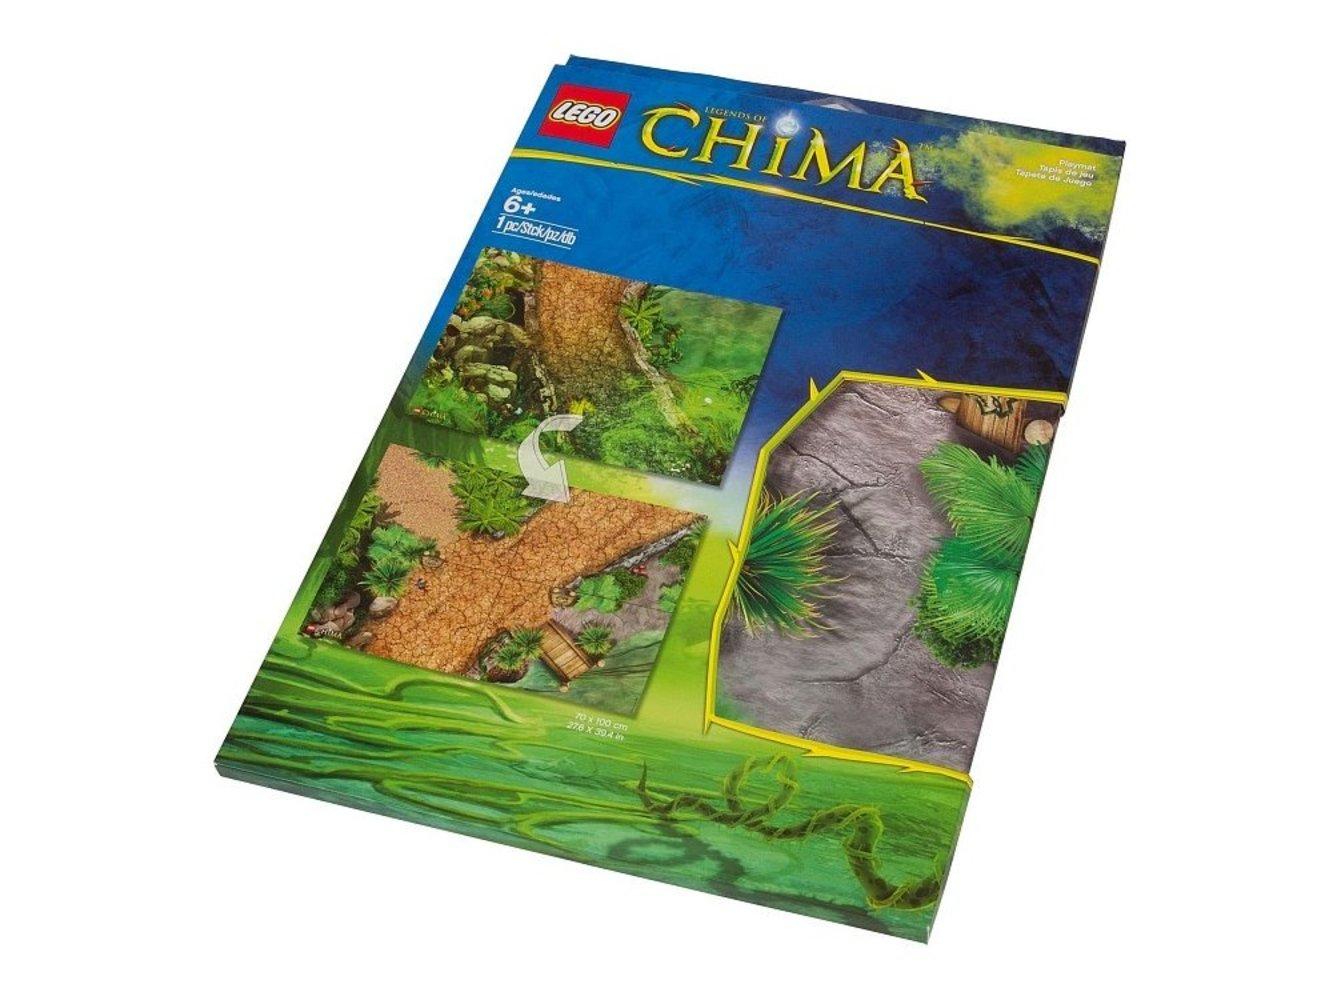 Legends of Chima Playmat